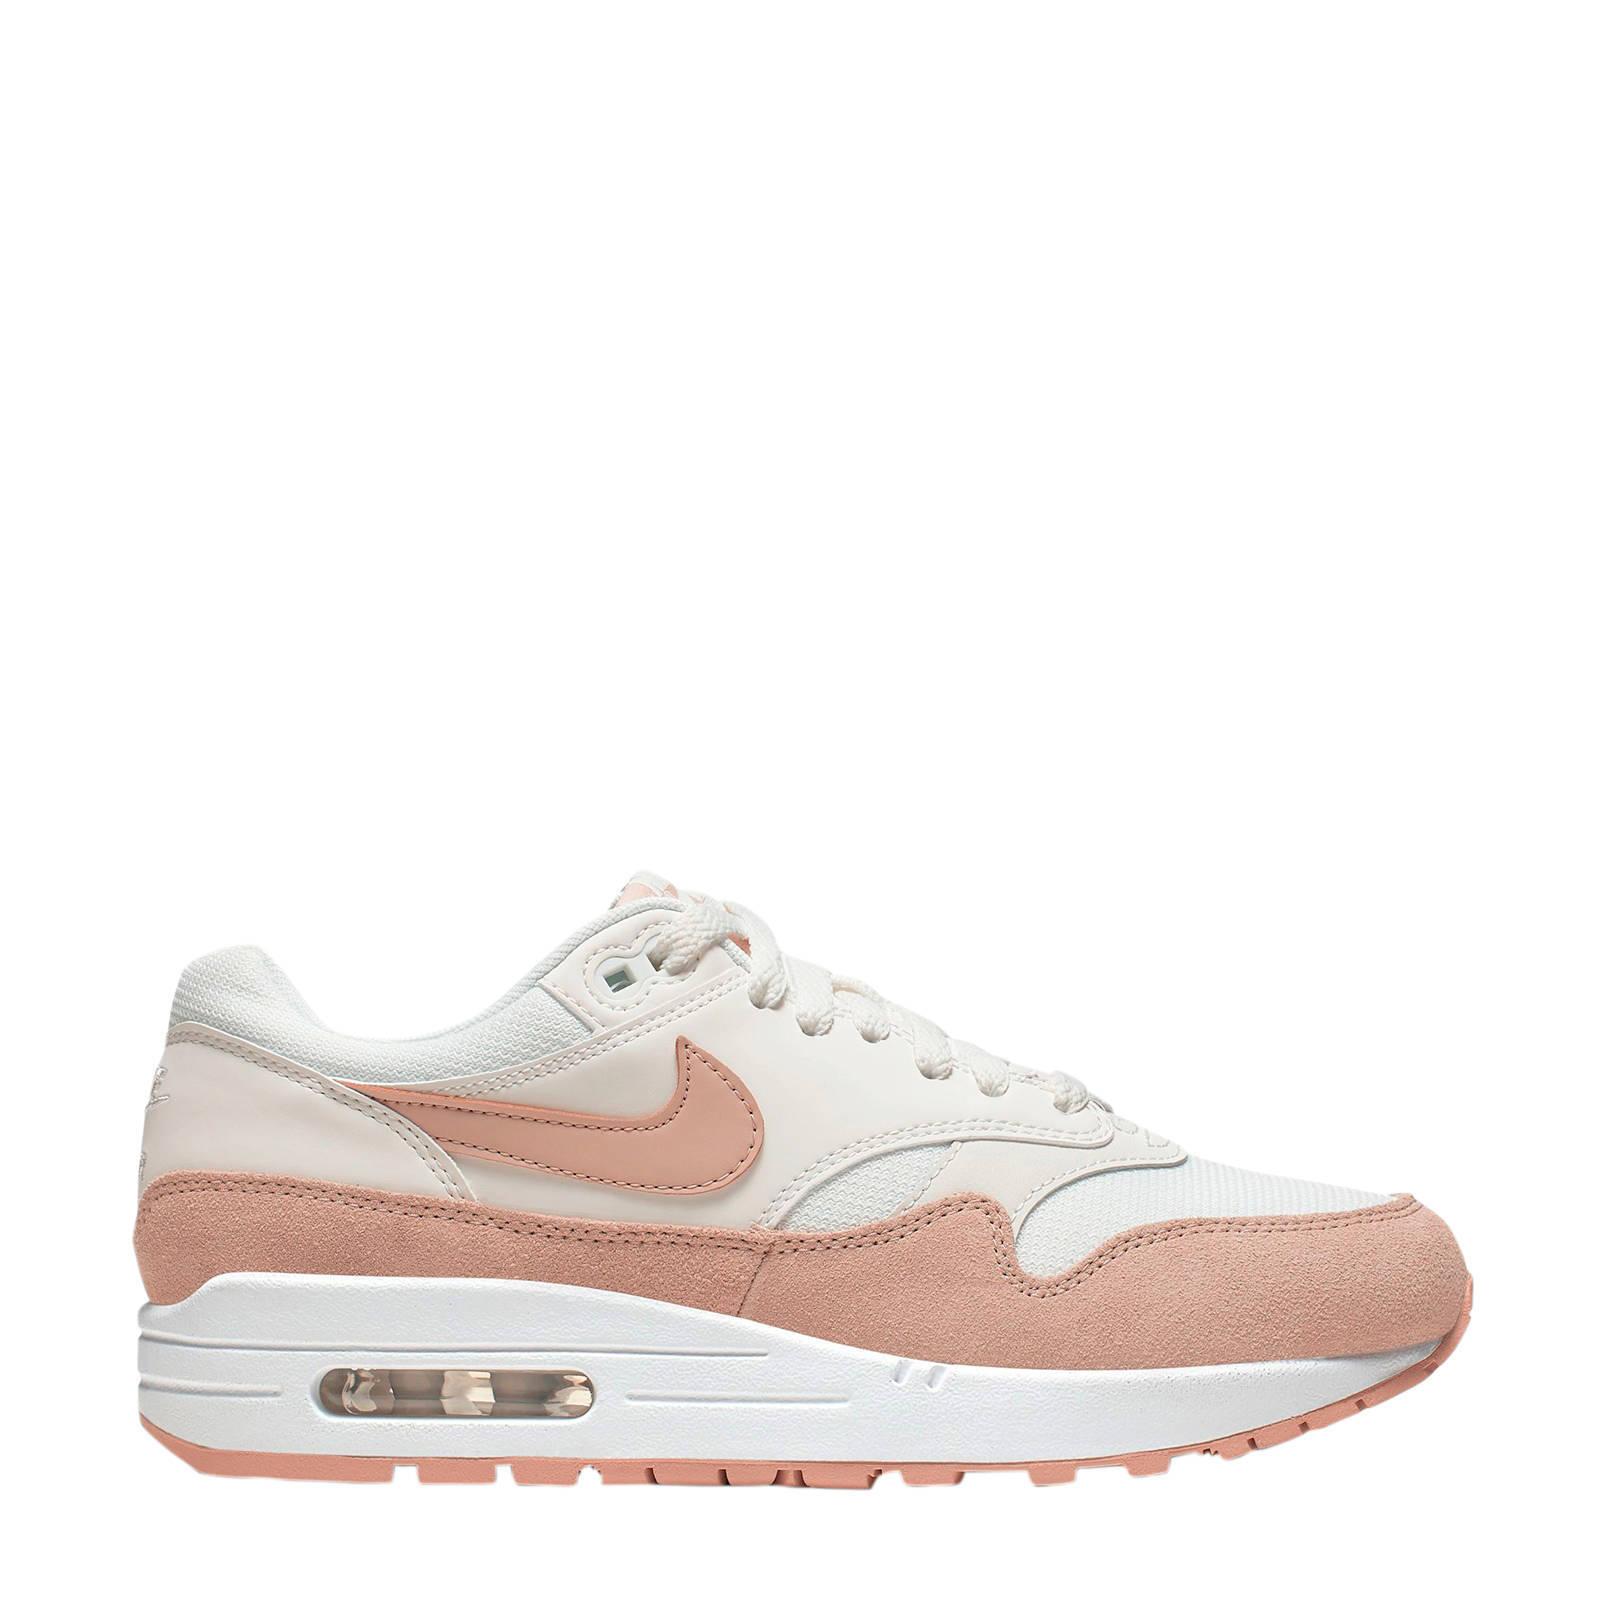 nike air max beige roze